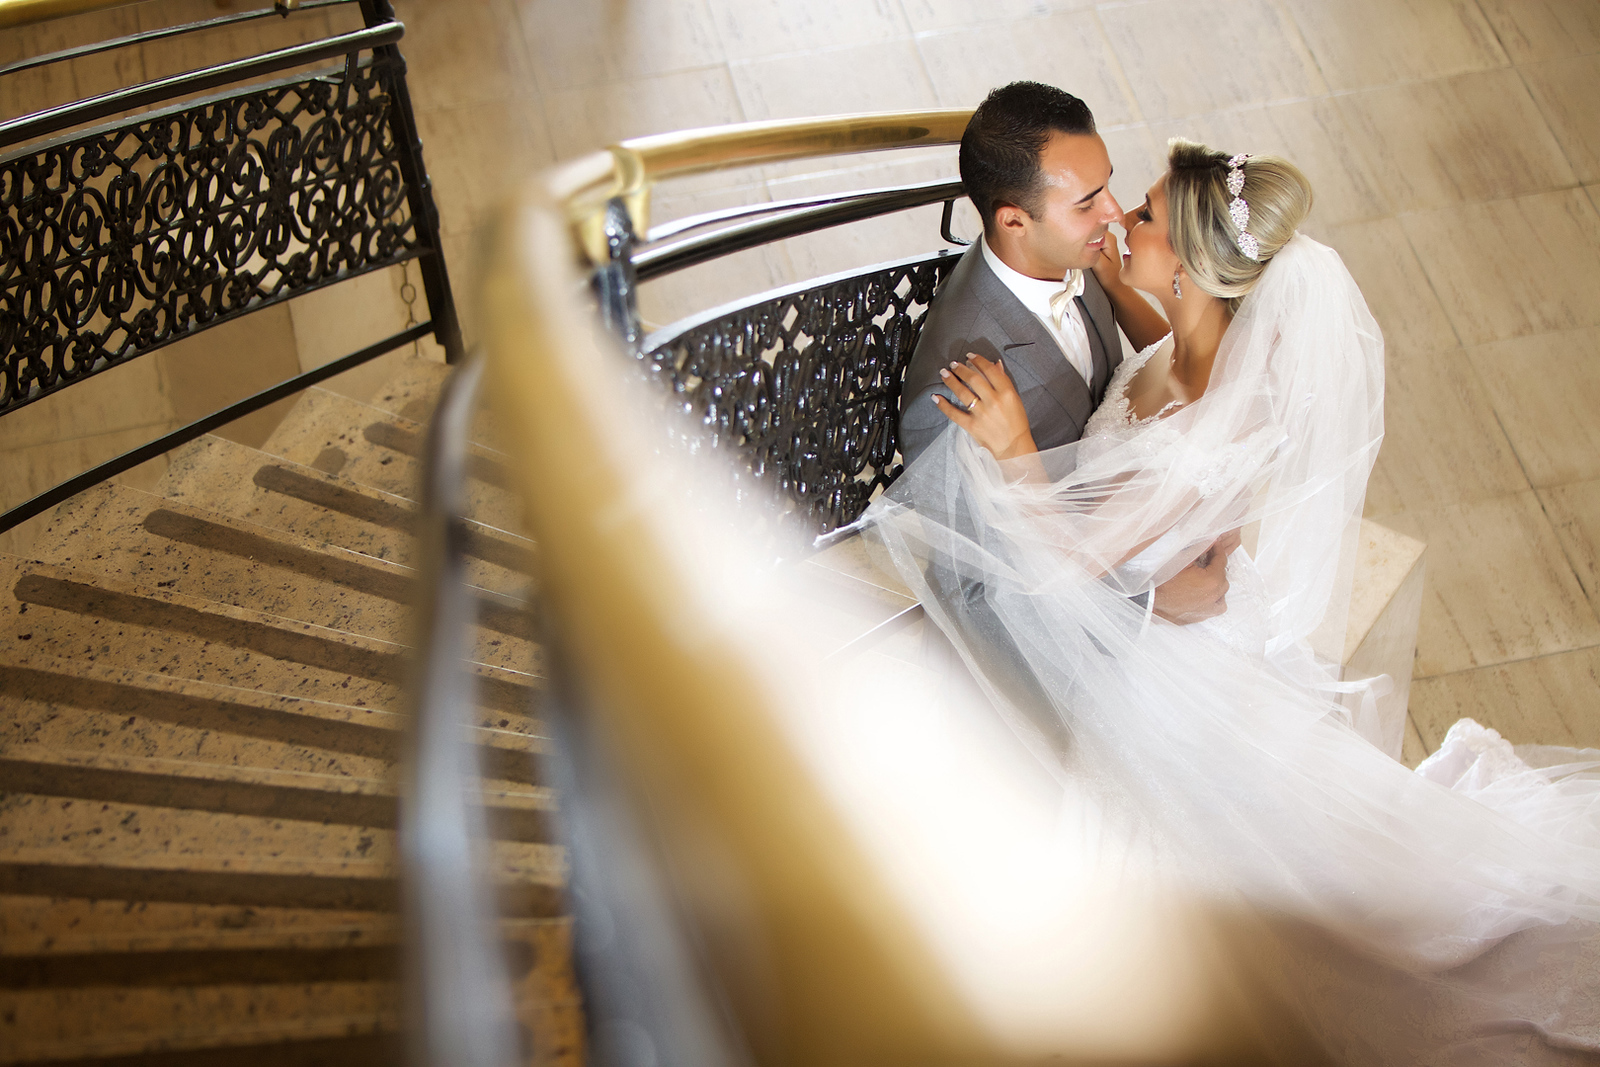 Noivos no ensaio de pos casamento no Miriam Maira Casa de festas encostados na escadaria